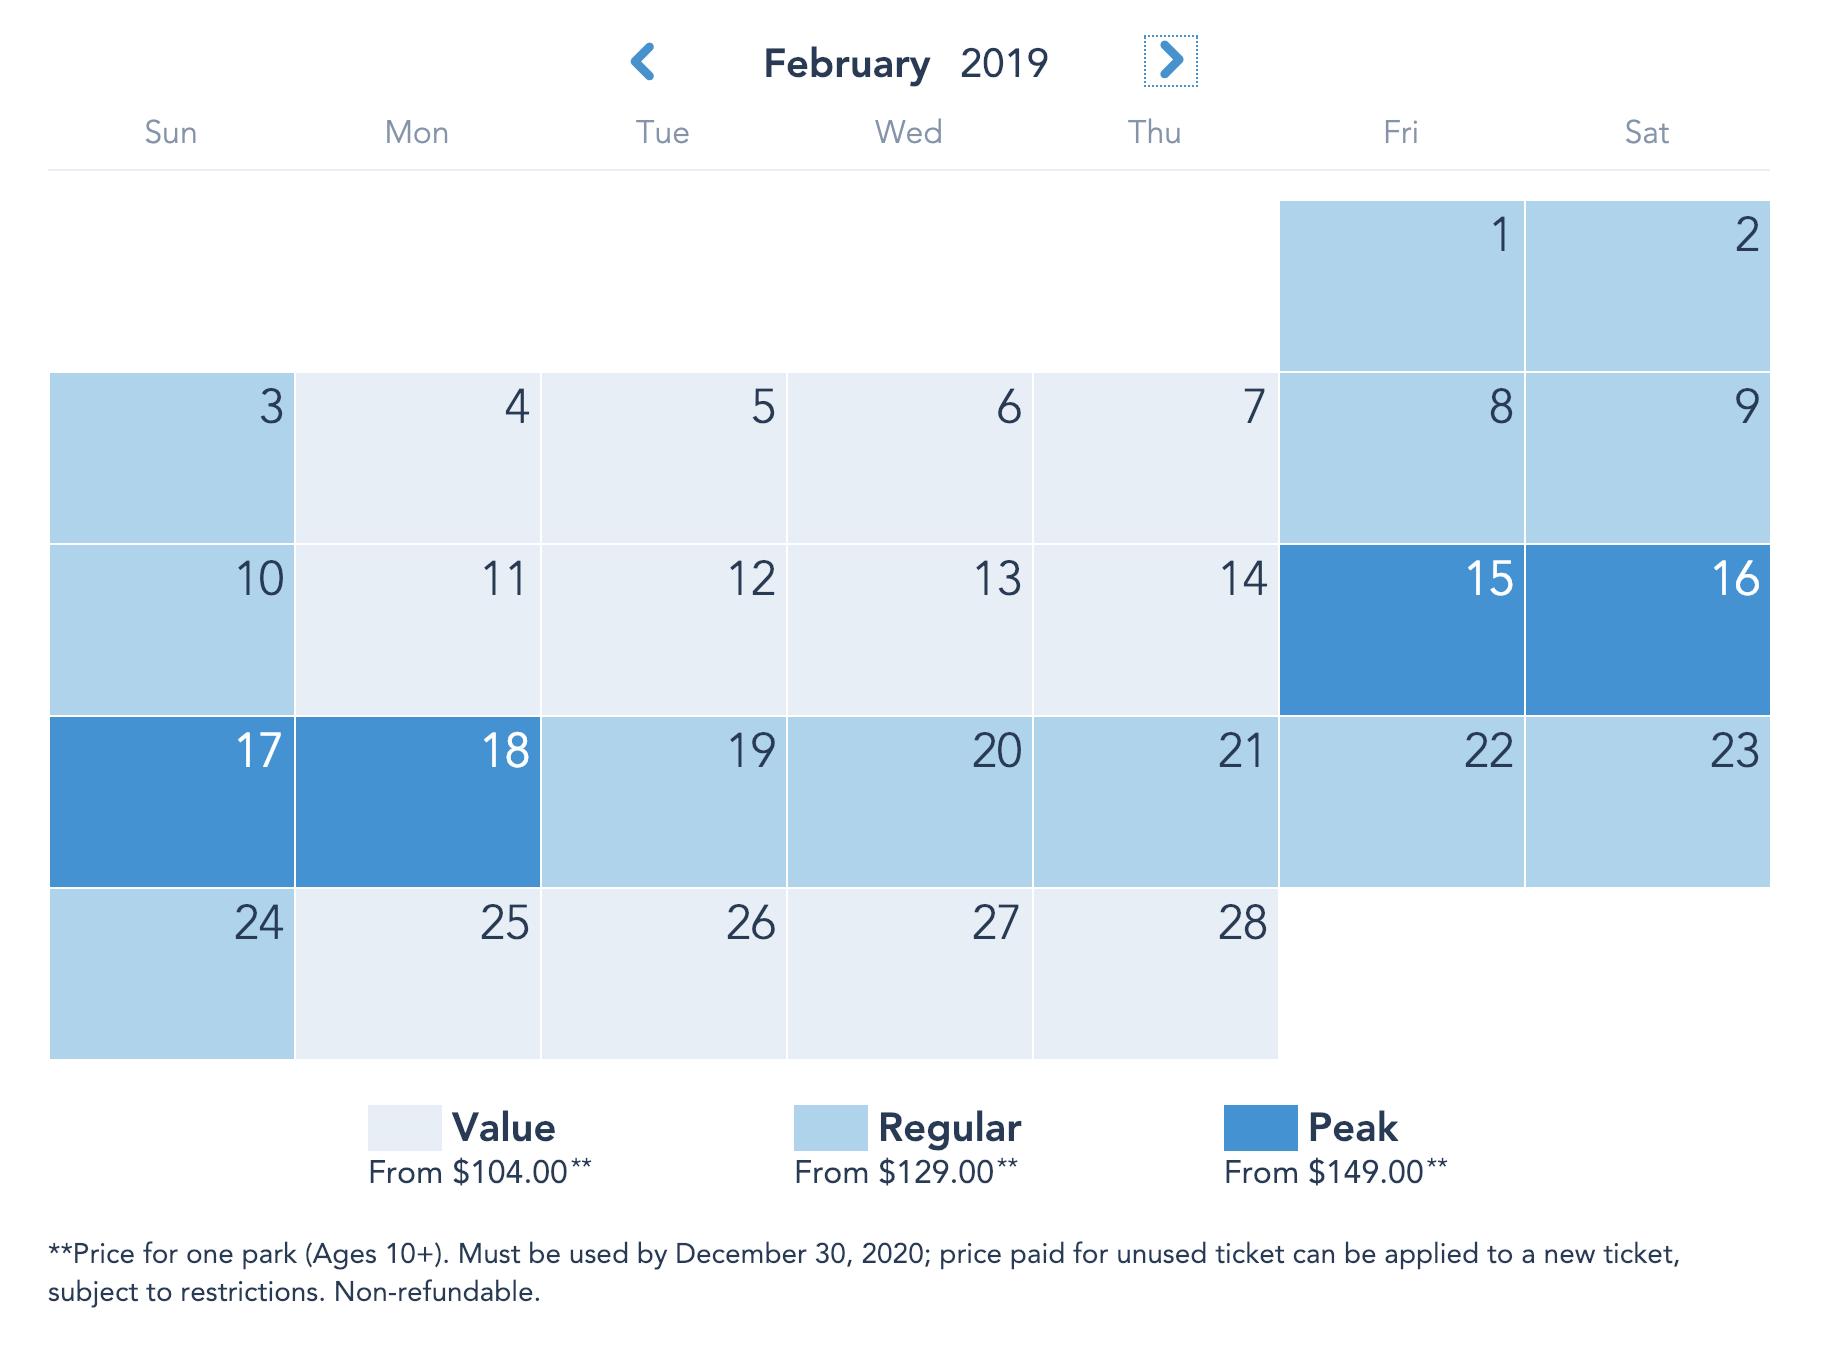 Disneyland Resort Prices - Febuary